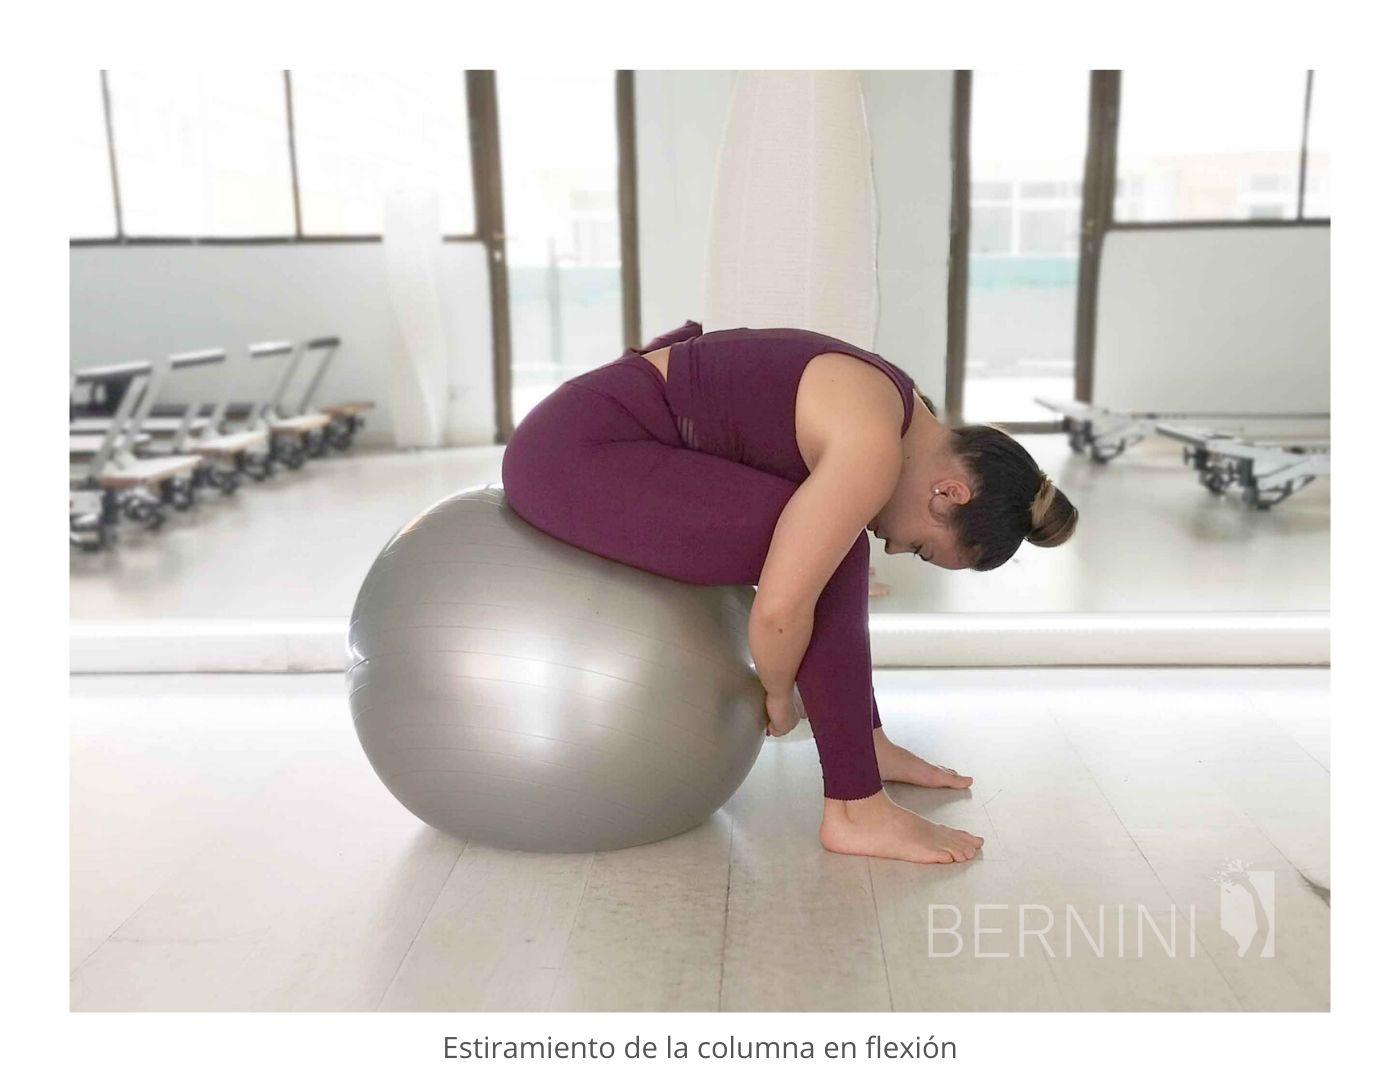 estiramiento columna fitball pilates mat bernini wellness